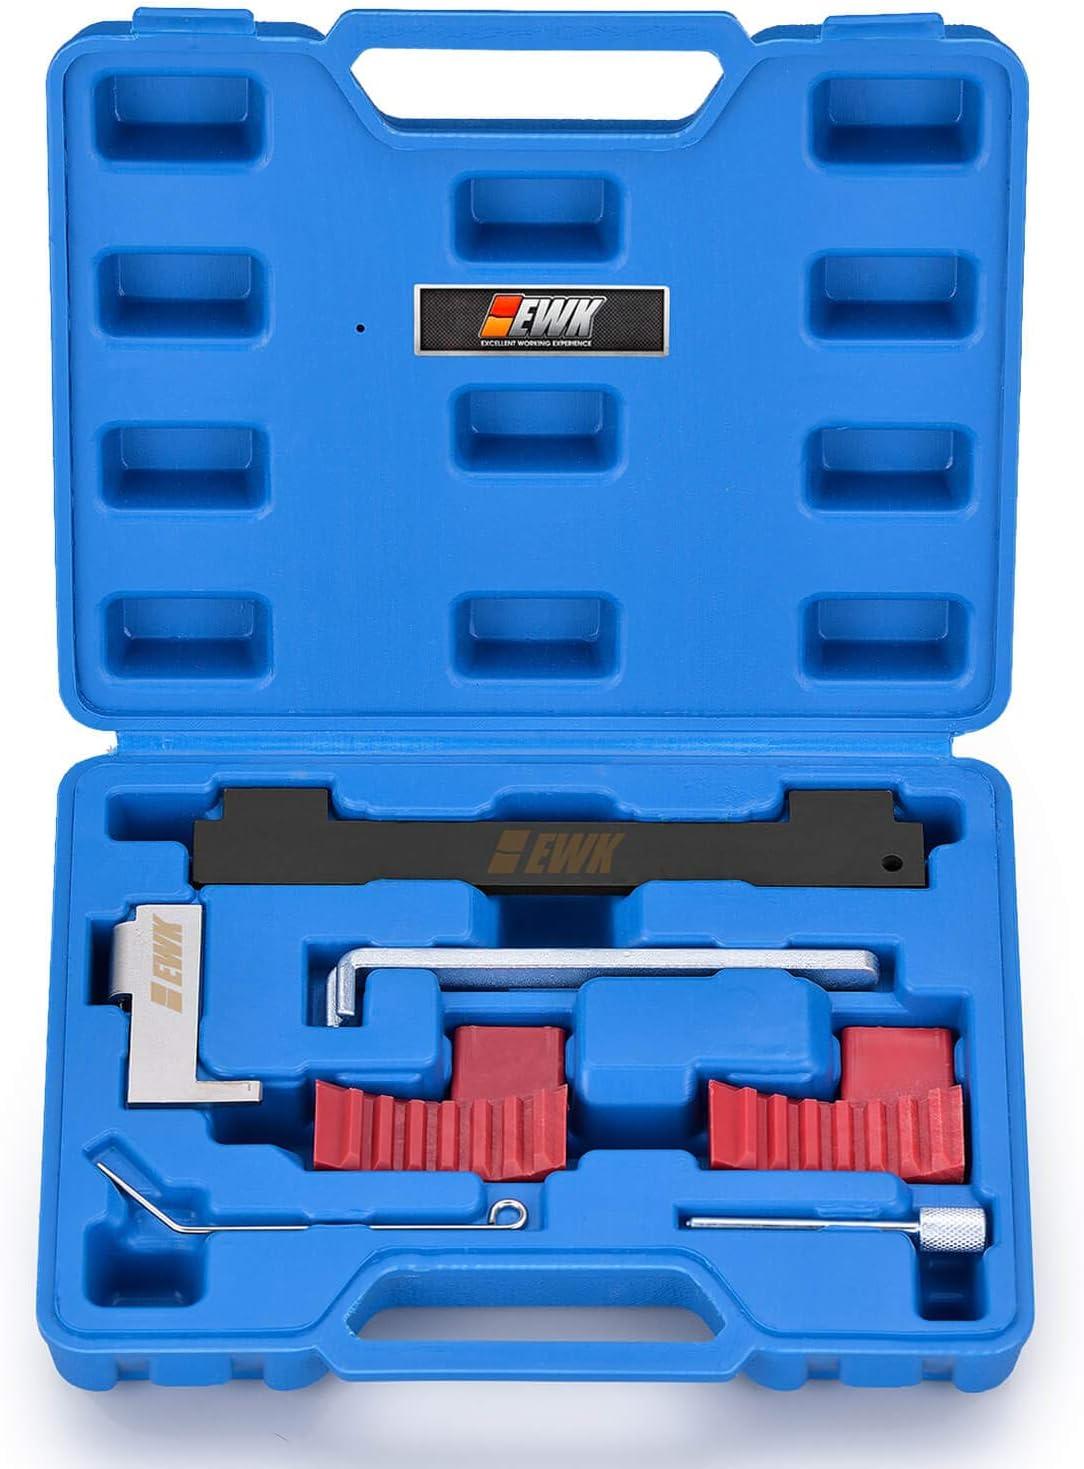 EWK EN-6340 Camshaft Locking Timing Belt Tool for Chevy Aveo Cruze Vauxhall Fiat SAAB Alfa 1.6 1.8 16V